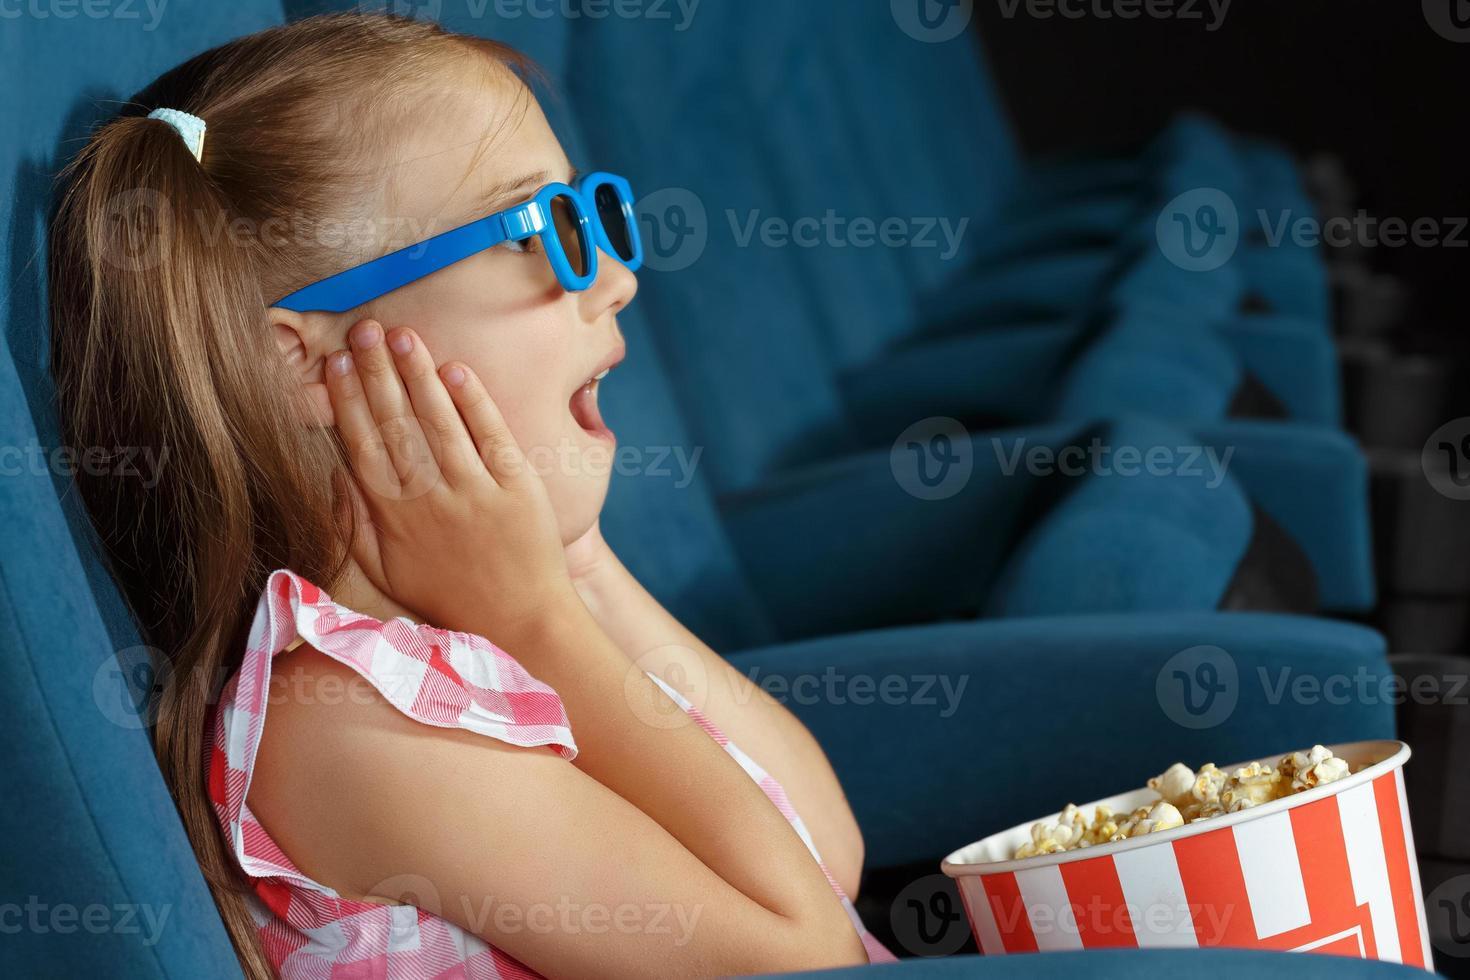 ravi petite fille regardant un film au cinéma photo